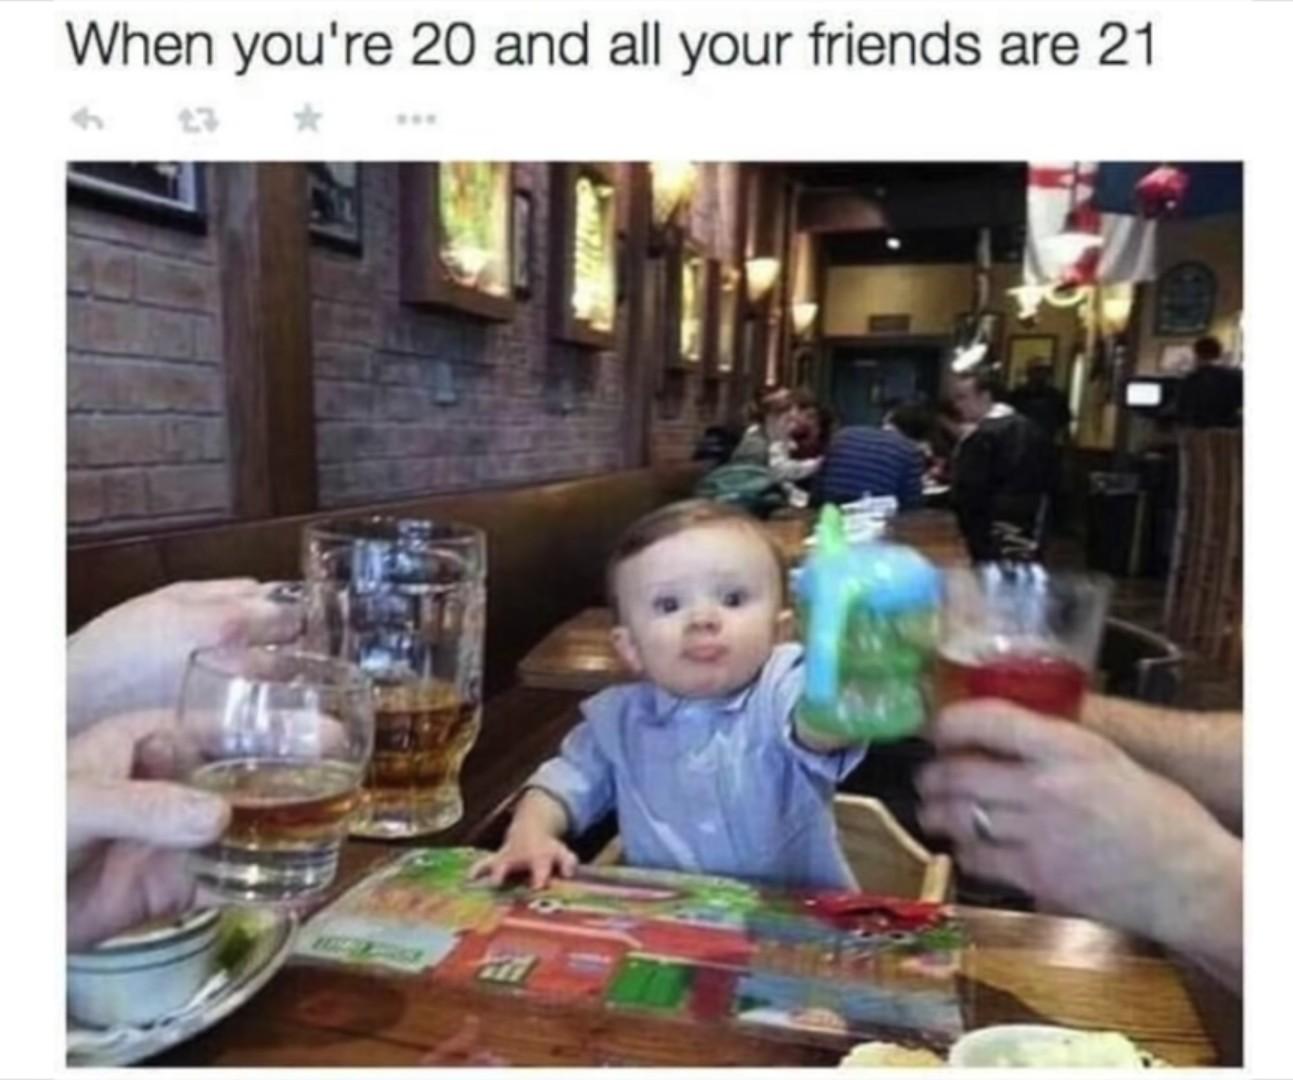 I am not that kind of friend... - meme